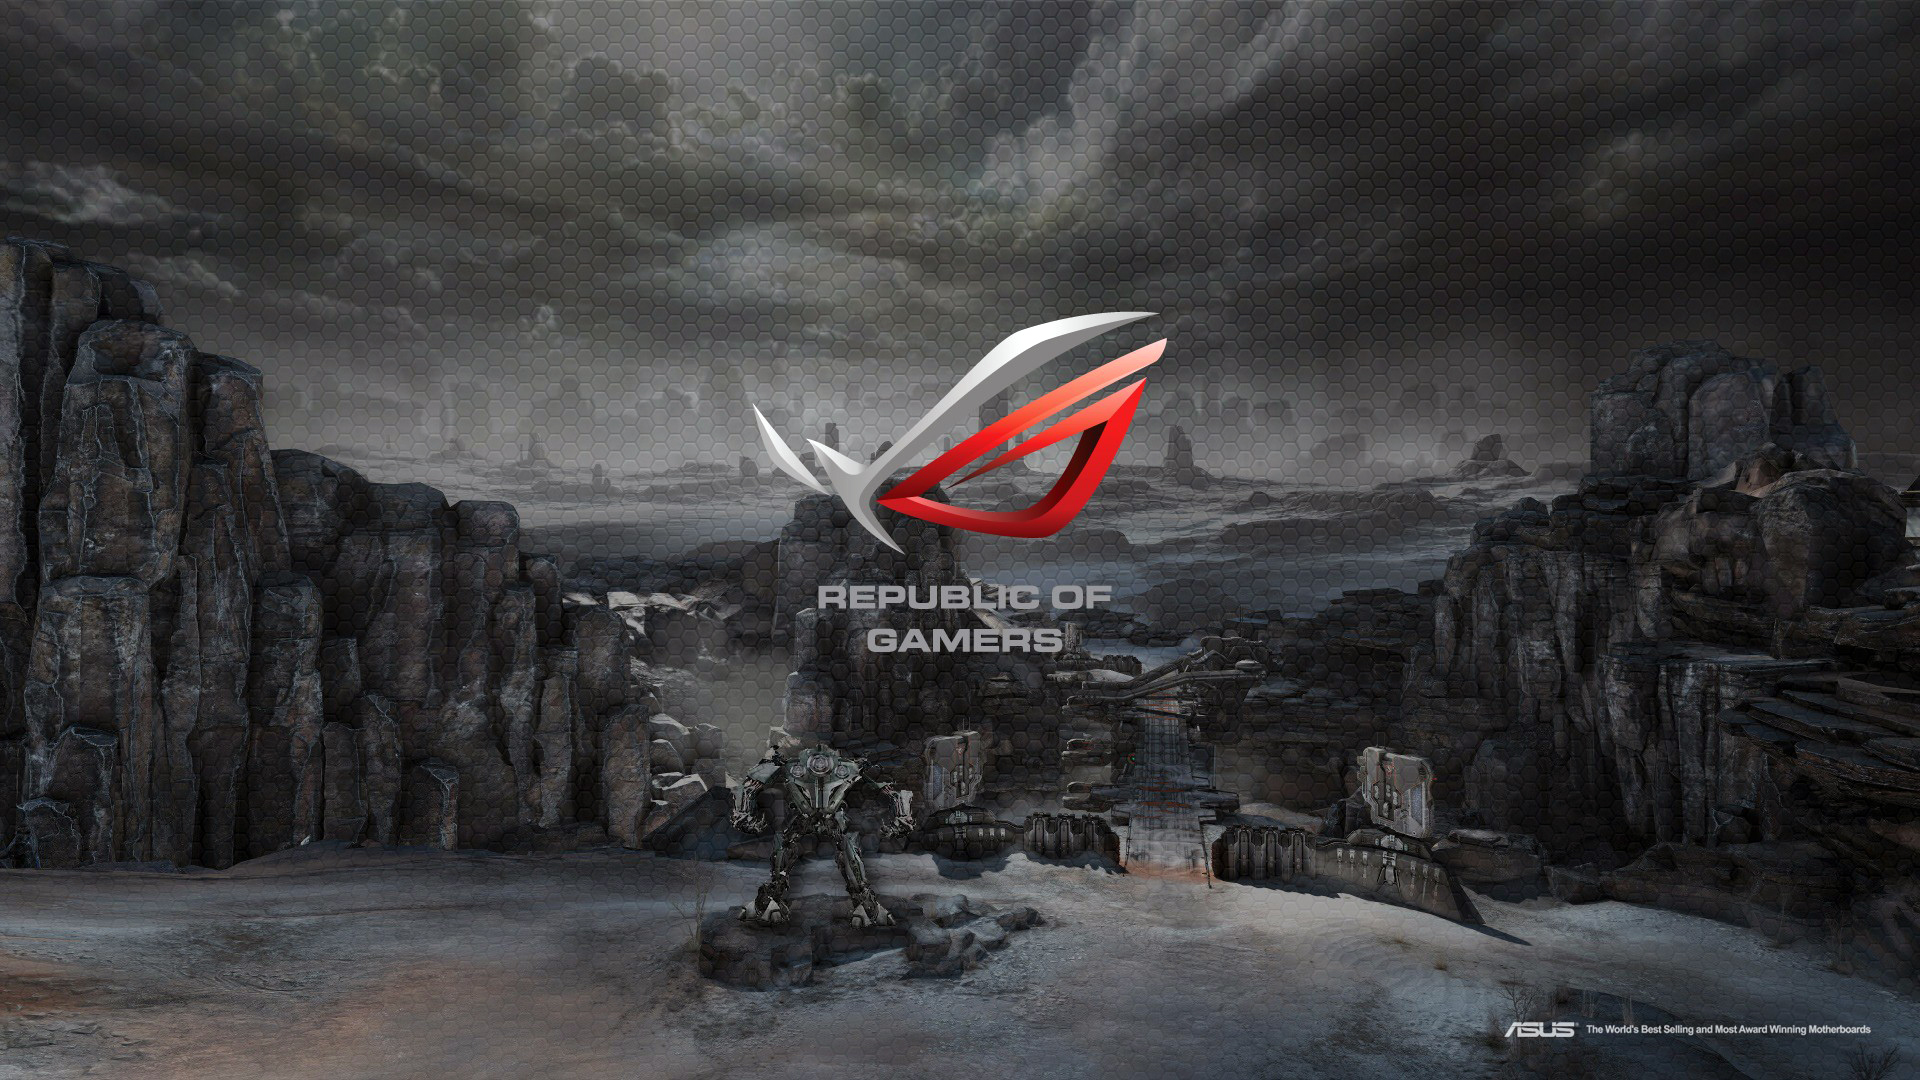 asus rog republic of gamers logo hd 1920x1080 1080p wallpaper and 1920x1080